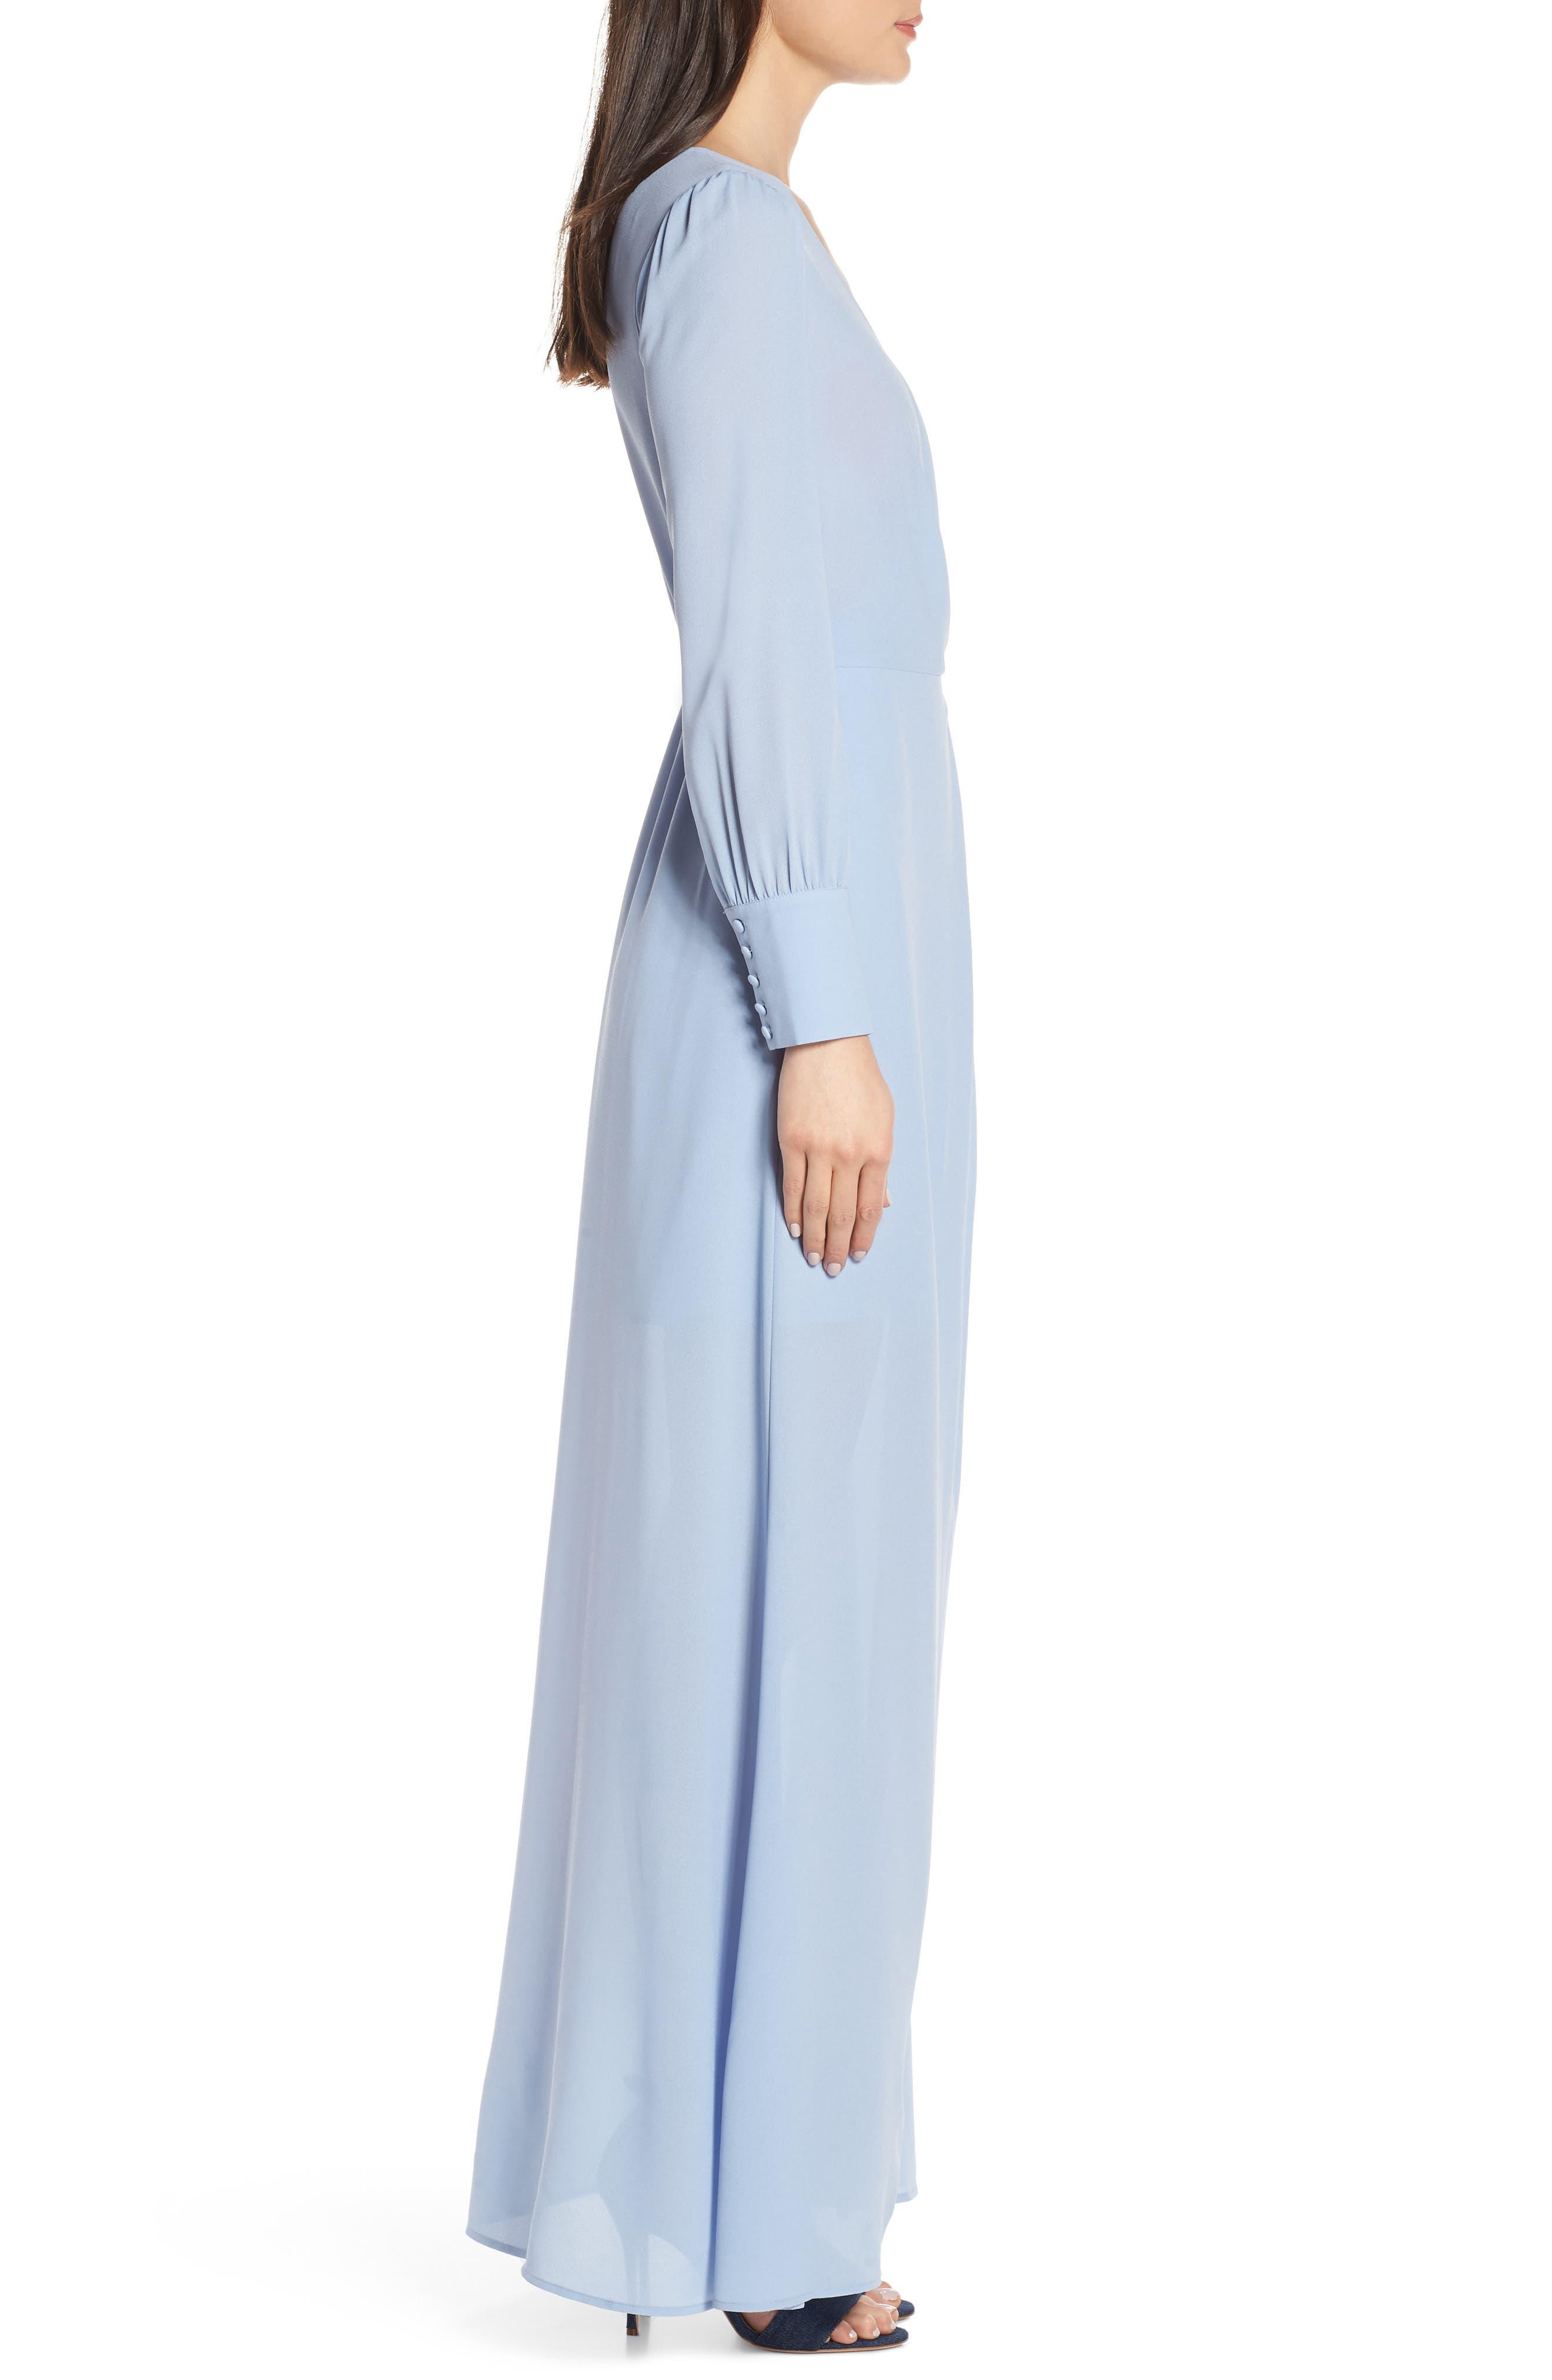 ALI & JAY, Garden Stroll Wrap Maxi Dress, Alternate thumbnail 4, color, 400